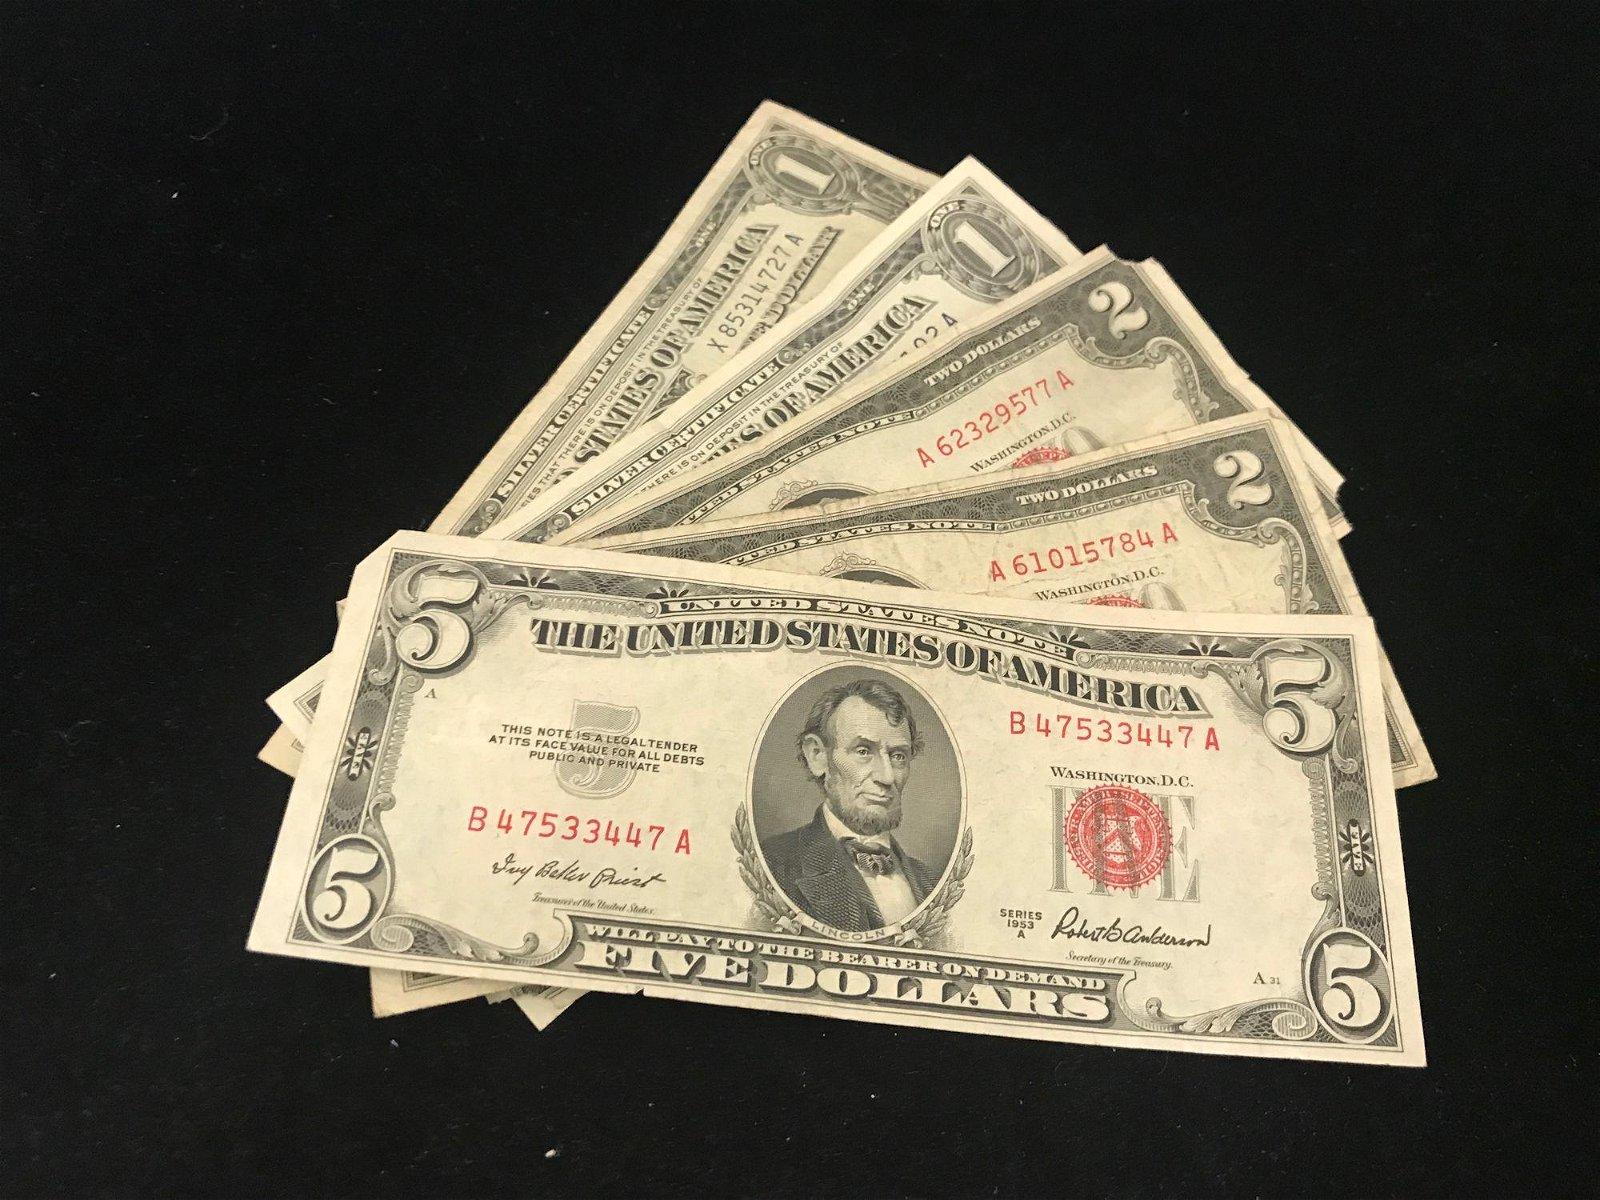 SERIES 1953 FIVE DOLLAR RED SEAL NOTE, 2 SERIES 1953